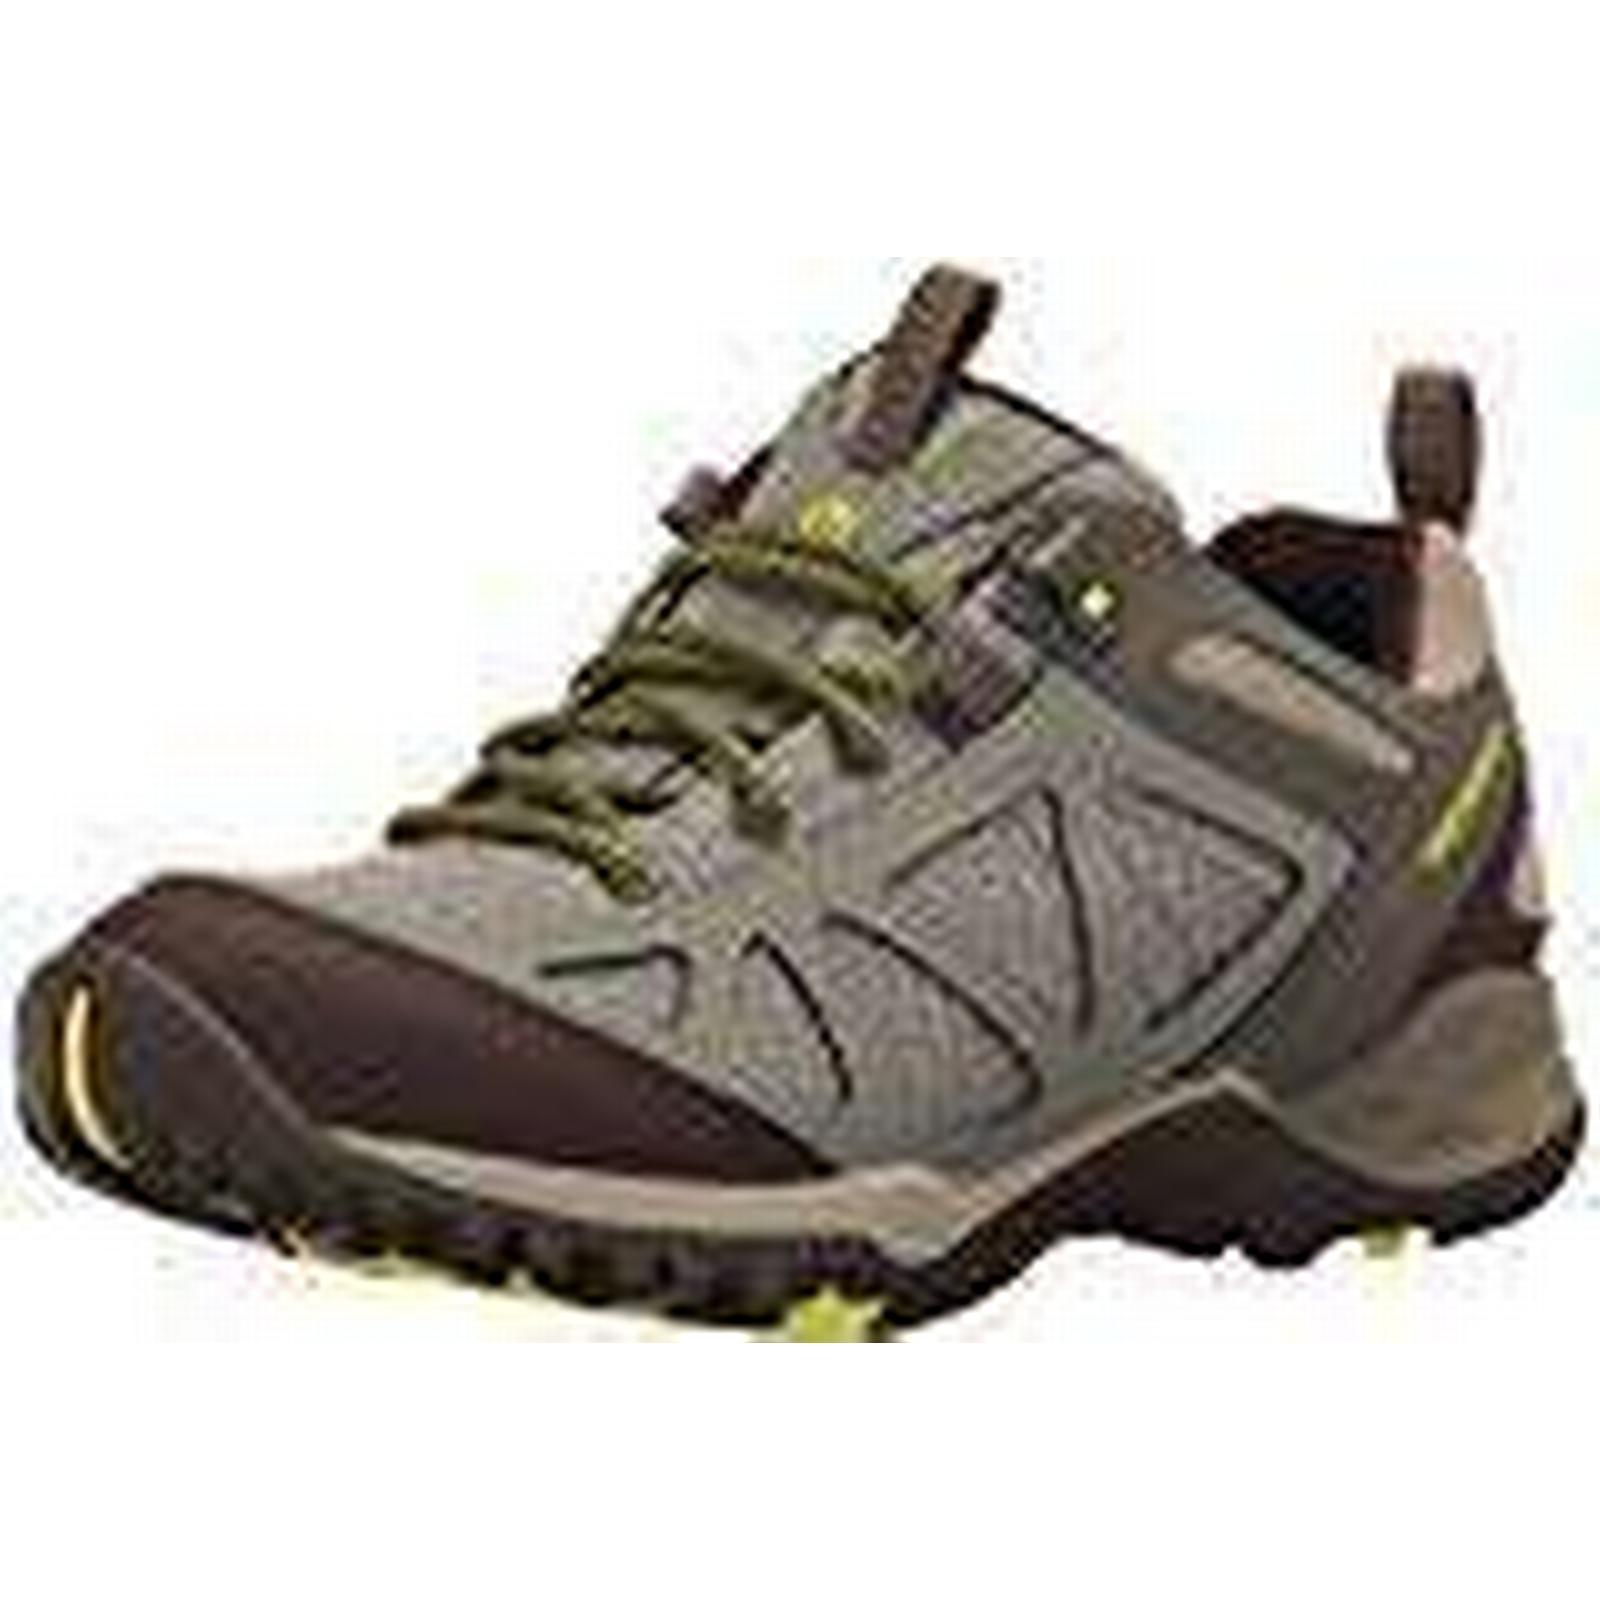 Merrell Women Siren Sport Q2 Low Rise Hiking Boots, Green (7.5 (Dusty Olive), 41 EU (7.5 Green UK) 0ca962